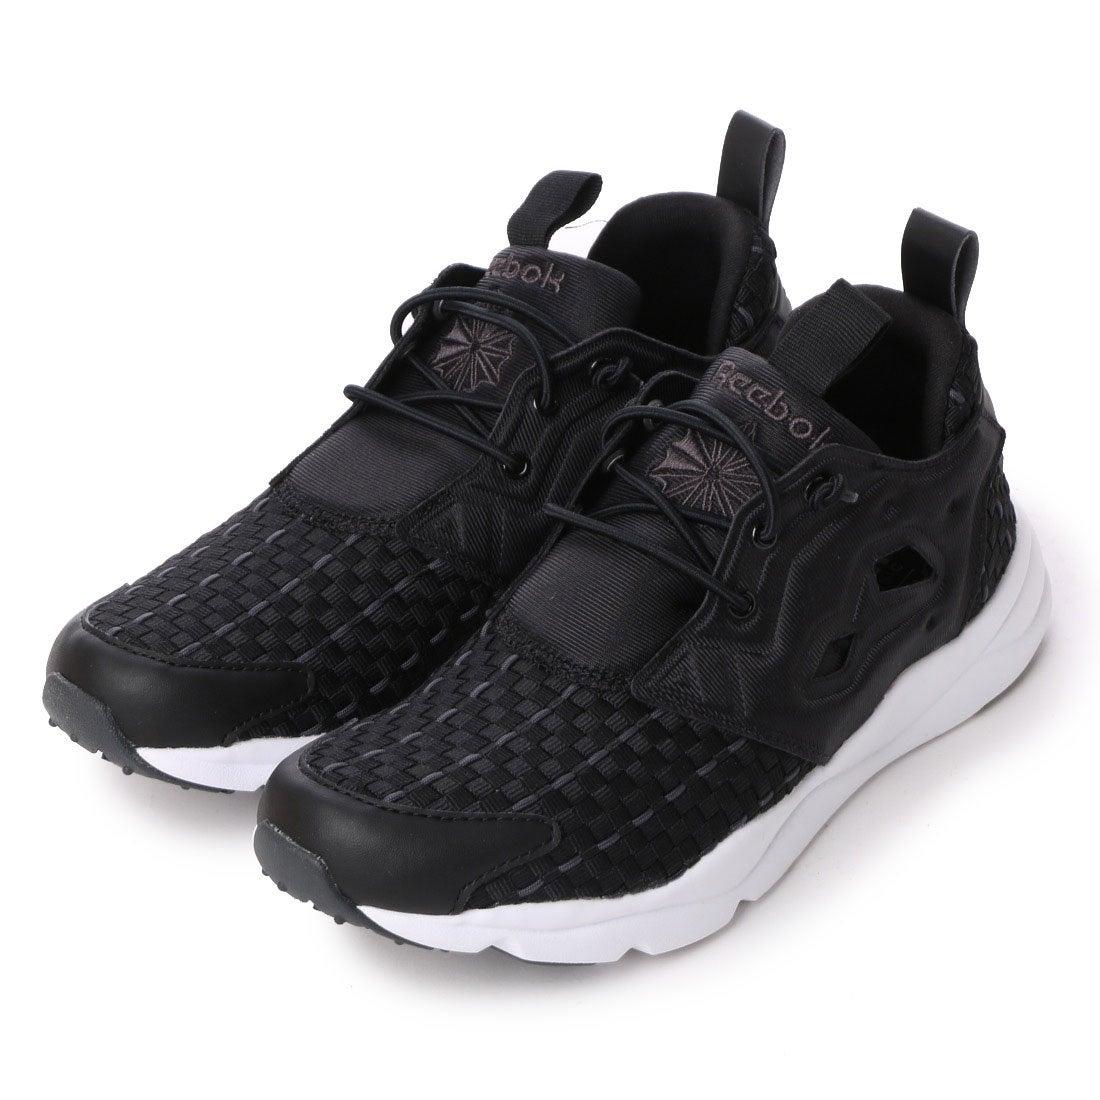 b75a45c9844 リーボック REEBOK FURYLITE NEW WOVEN(フューリーライトニューウーブン) V70798  (ブラック DGHソリッドグレー ホワイト レディース ) -靴&ファッション通販 ...